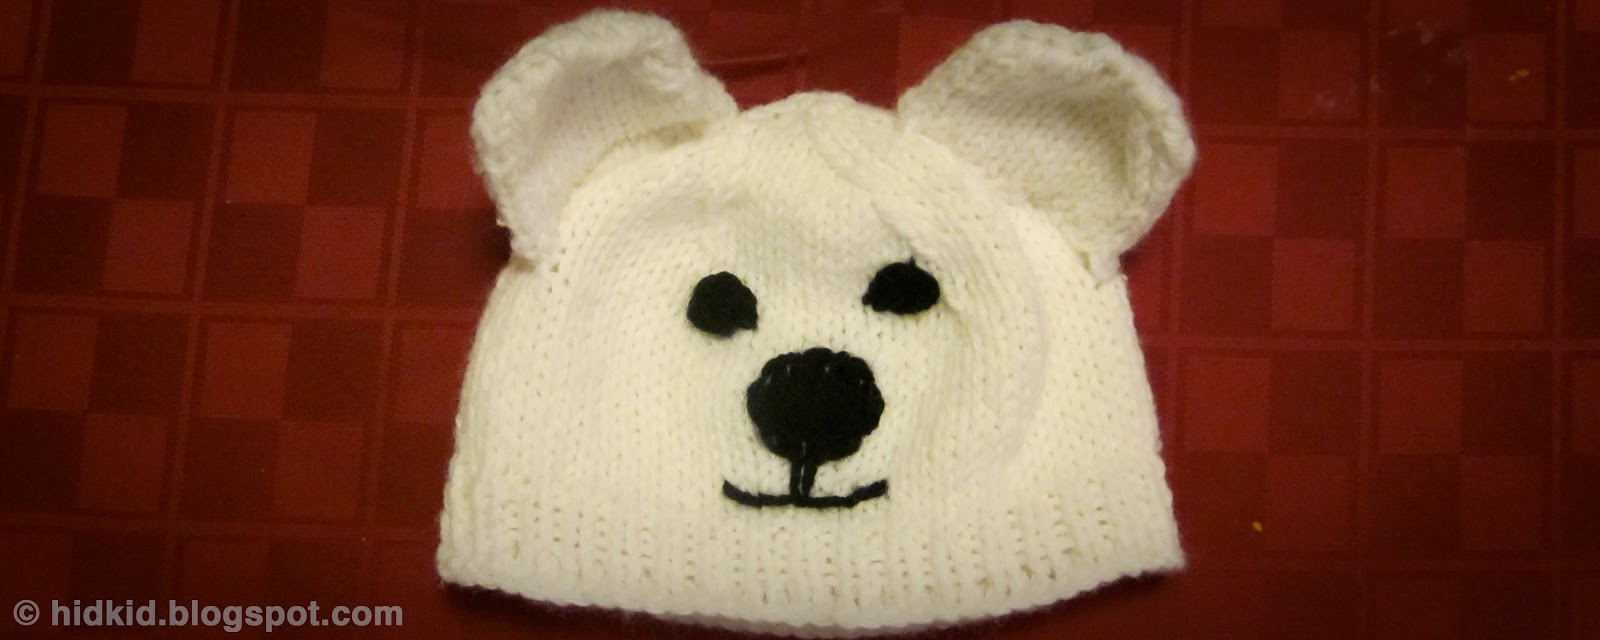 Craftimism: Polar Bear Knit Hat